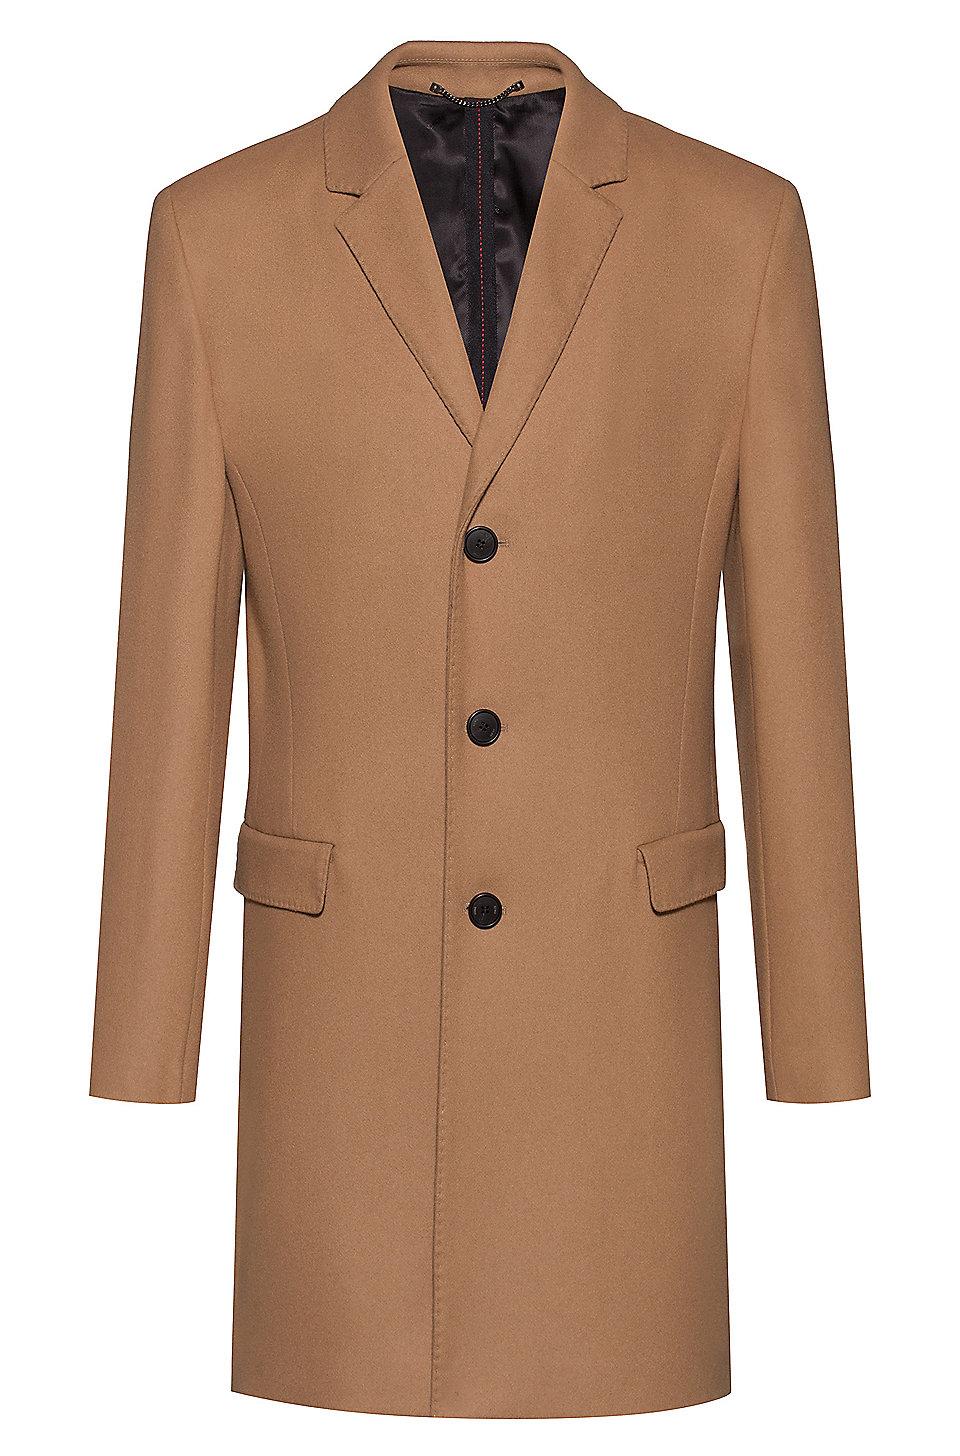 Slim Fit Coat In A Wool Blend by Boss